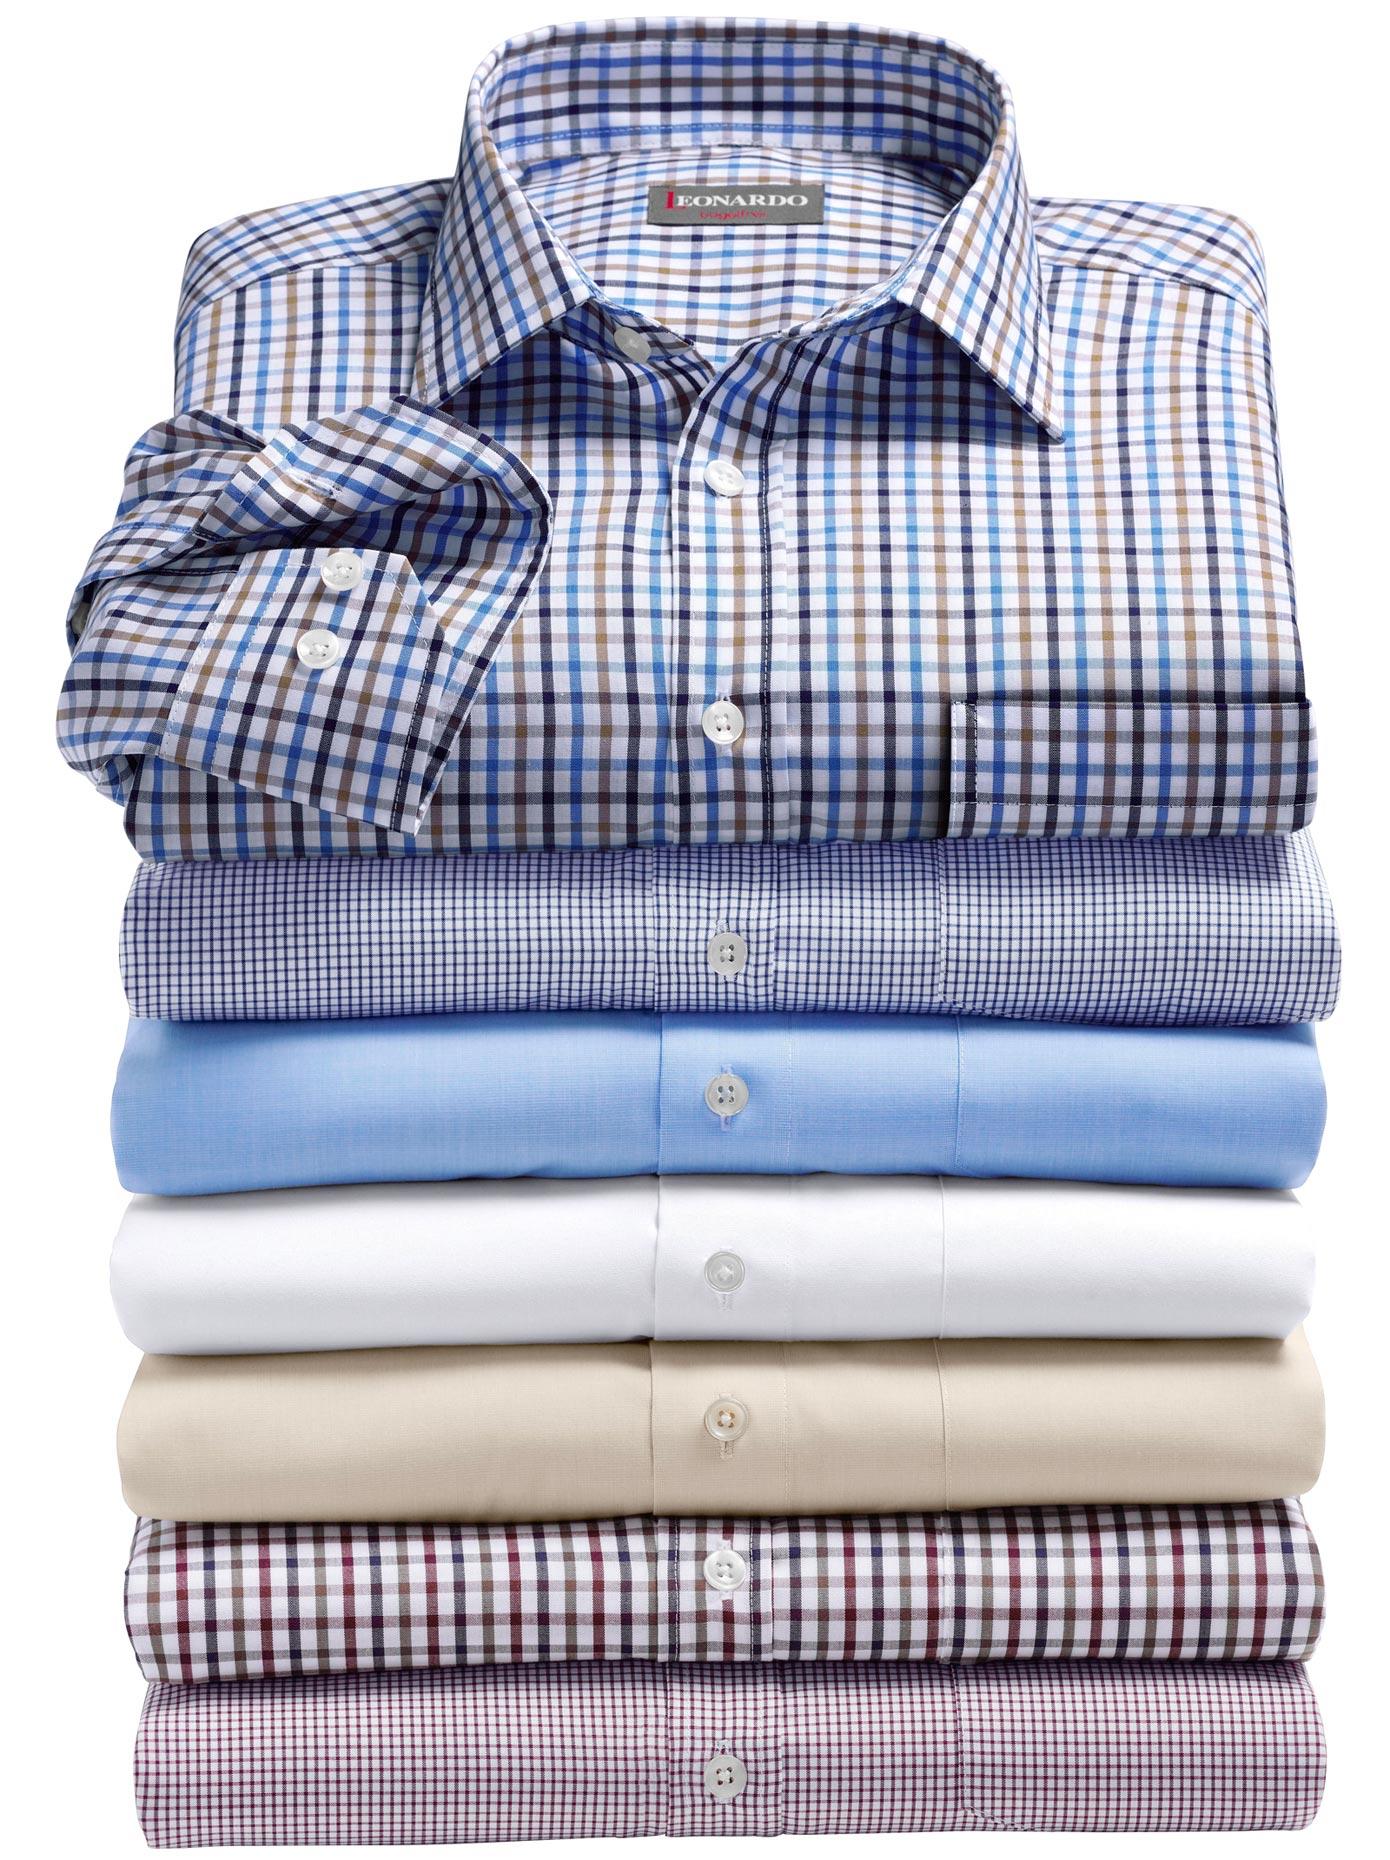 Classic Langarm-Hemd in feiner Dessinierung   Bekleidung > Hemden > Sonstige Hemden   Blau   Classic